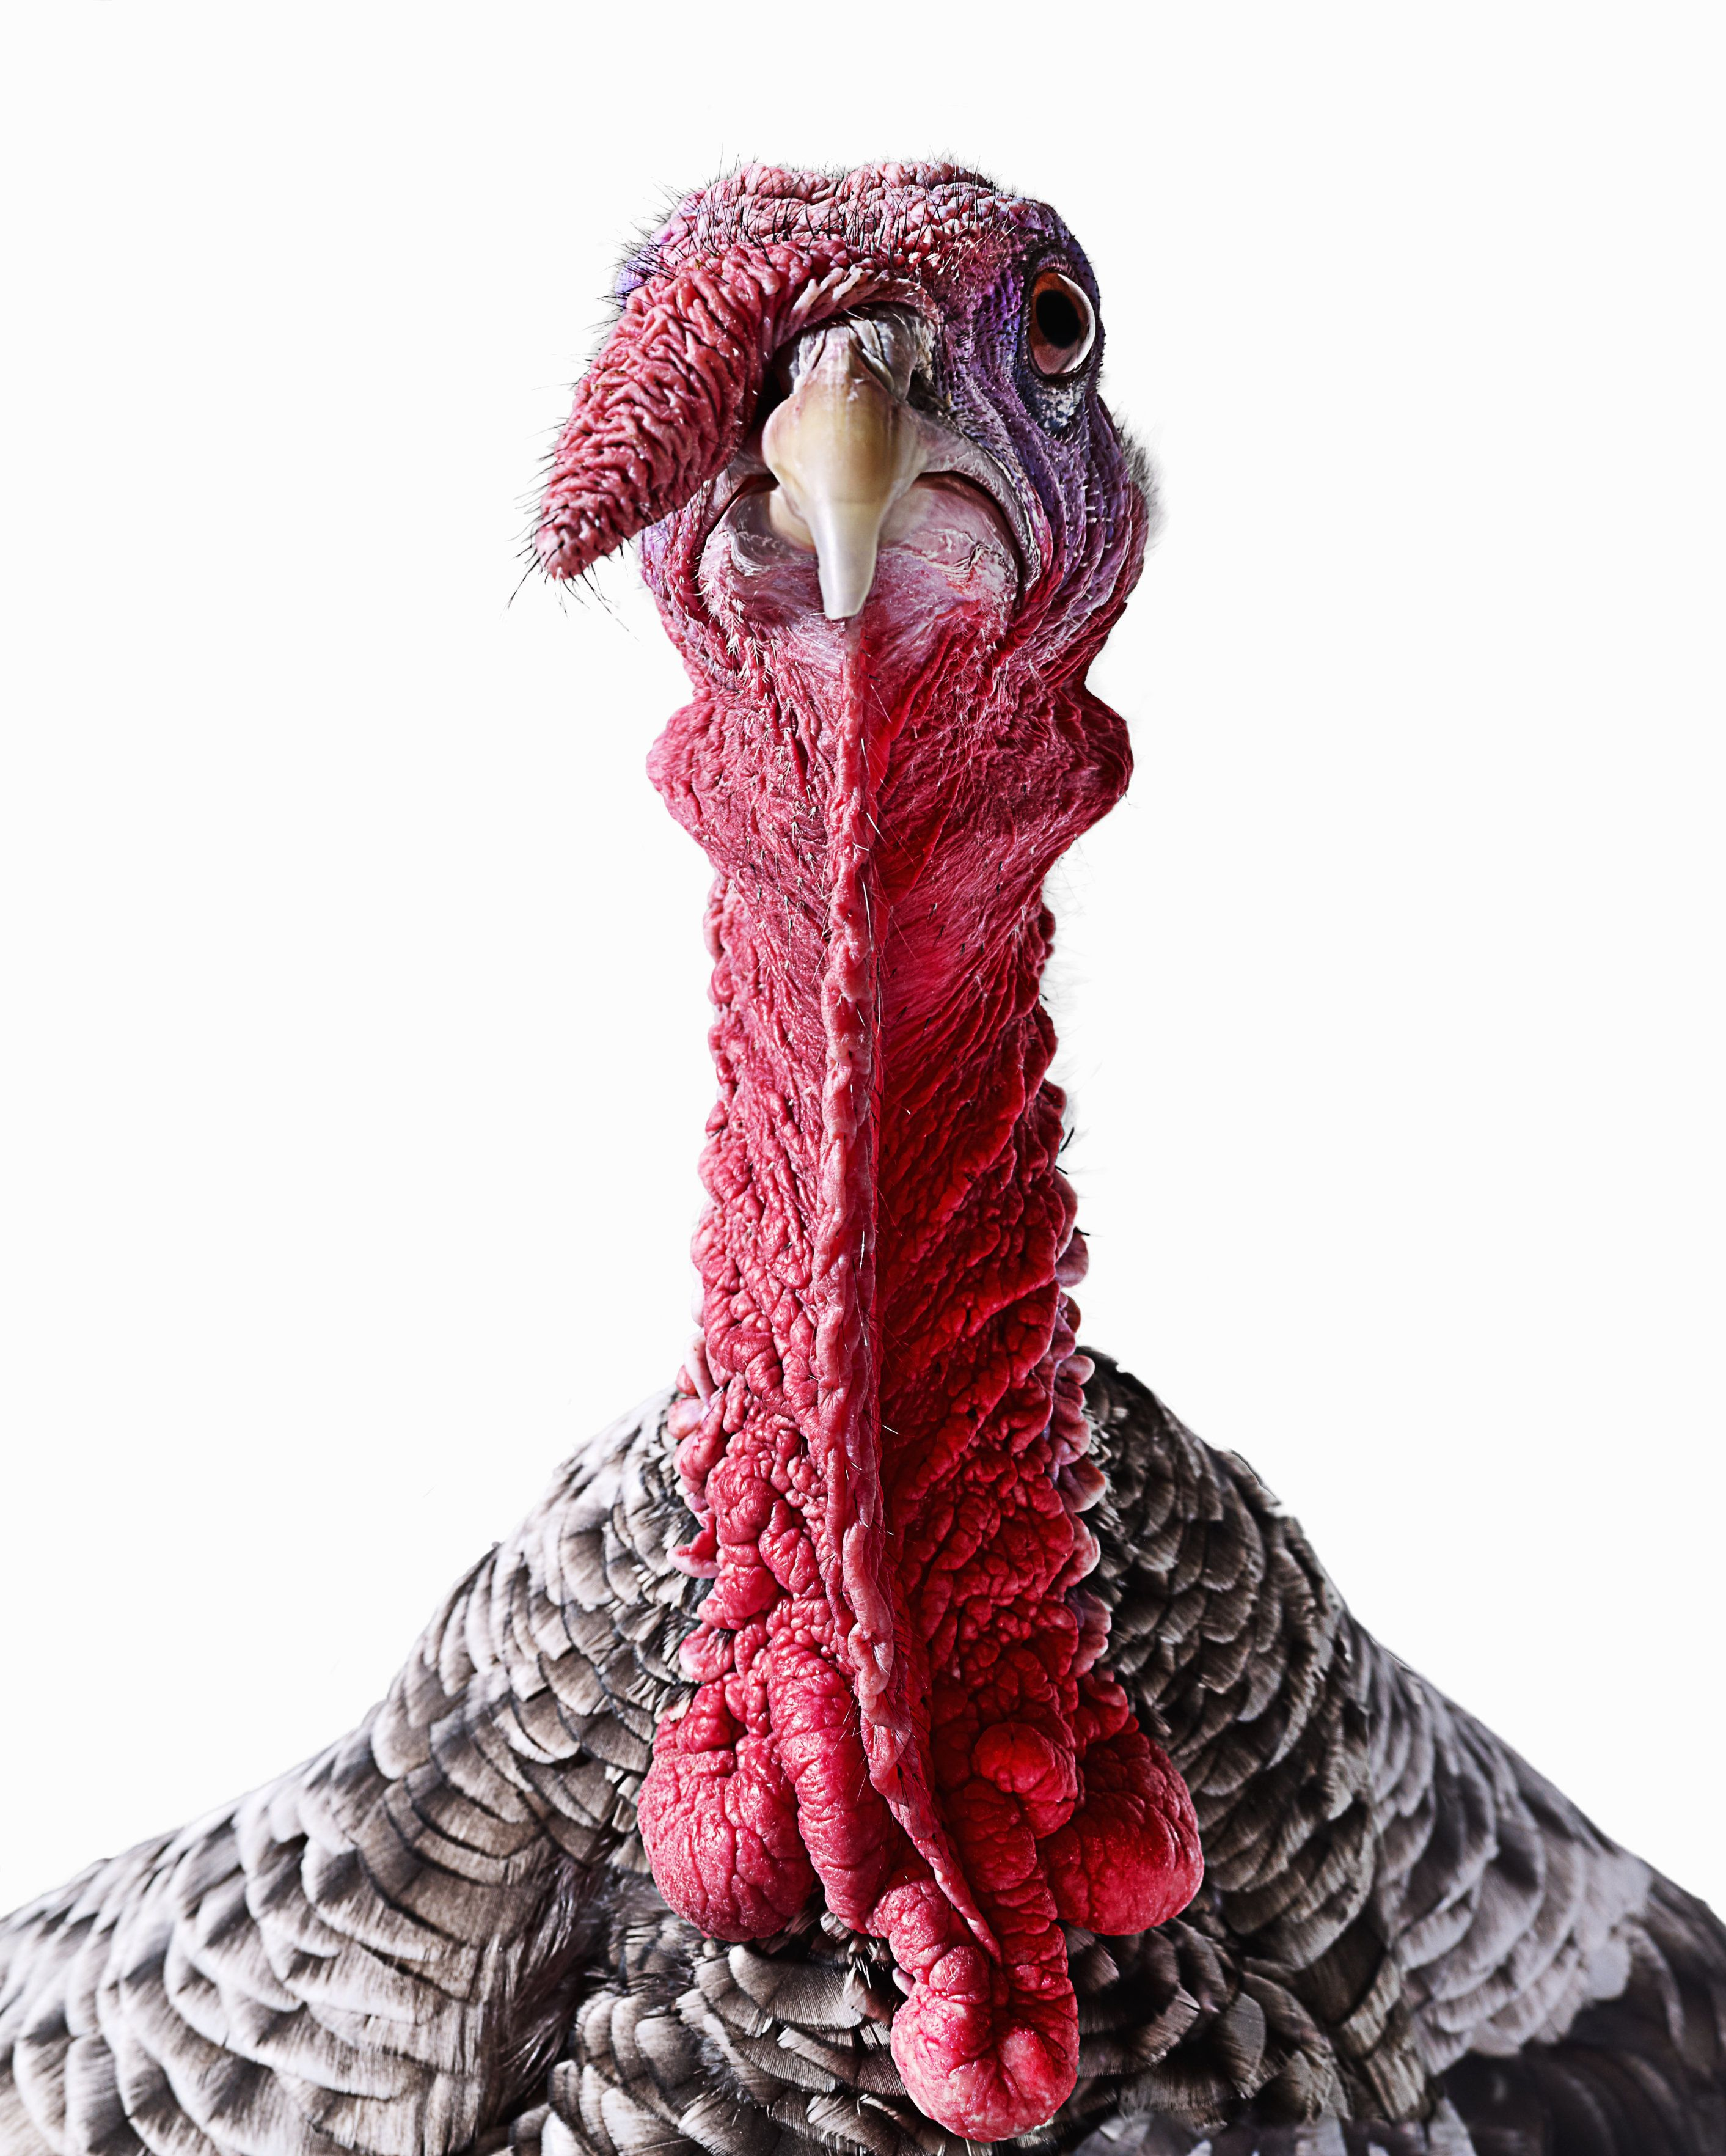 Behold: the famed turkey head.